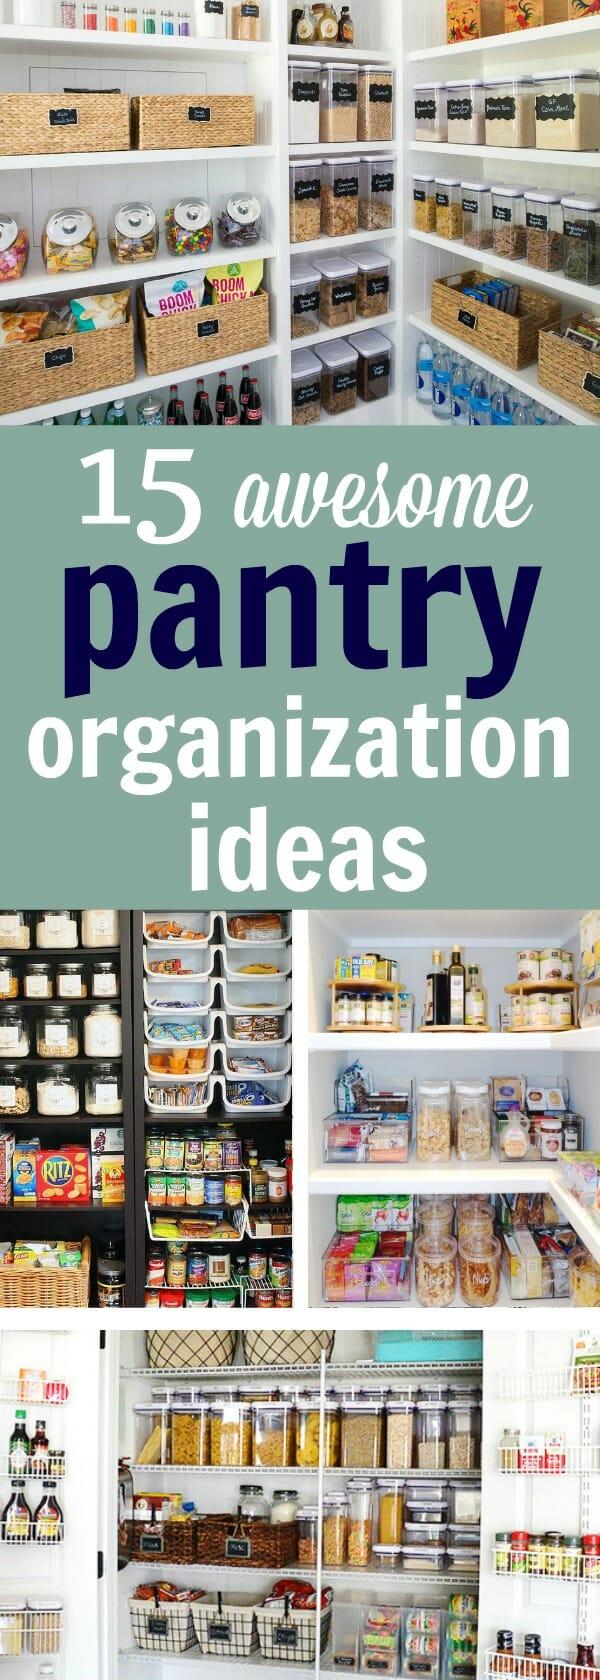 15 pantry organization ideas - My Mommy Style